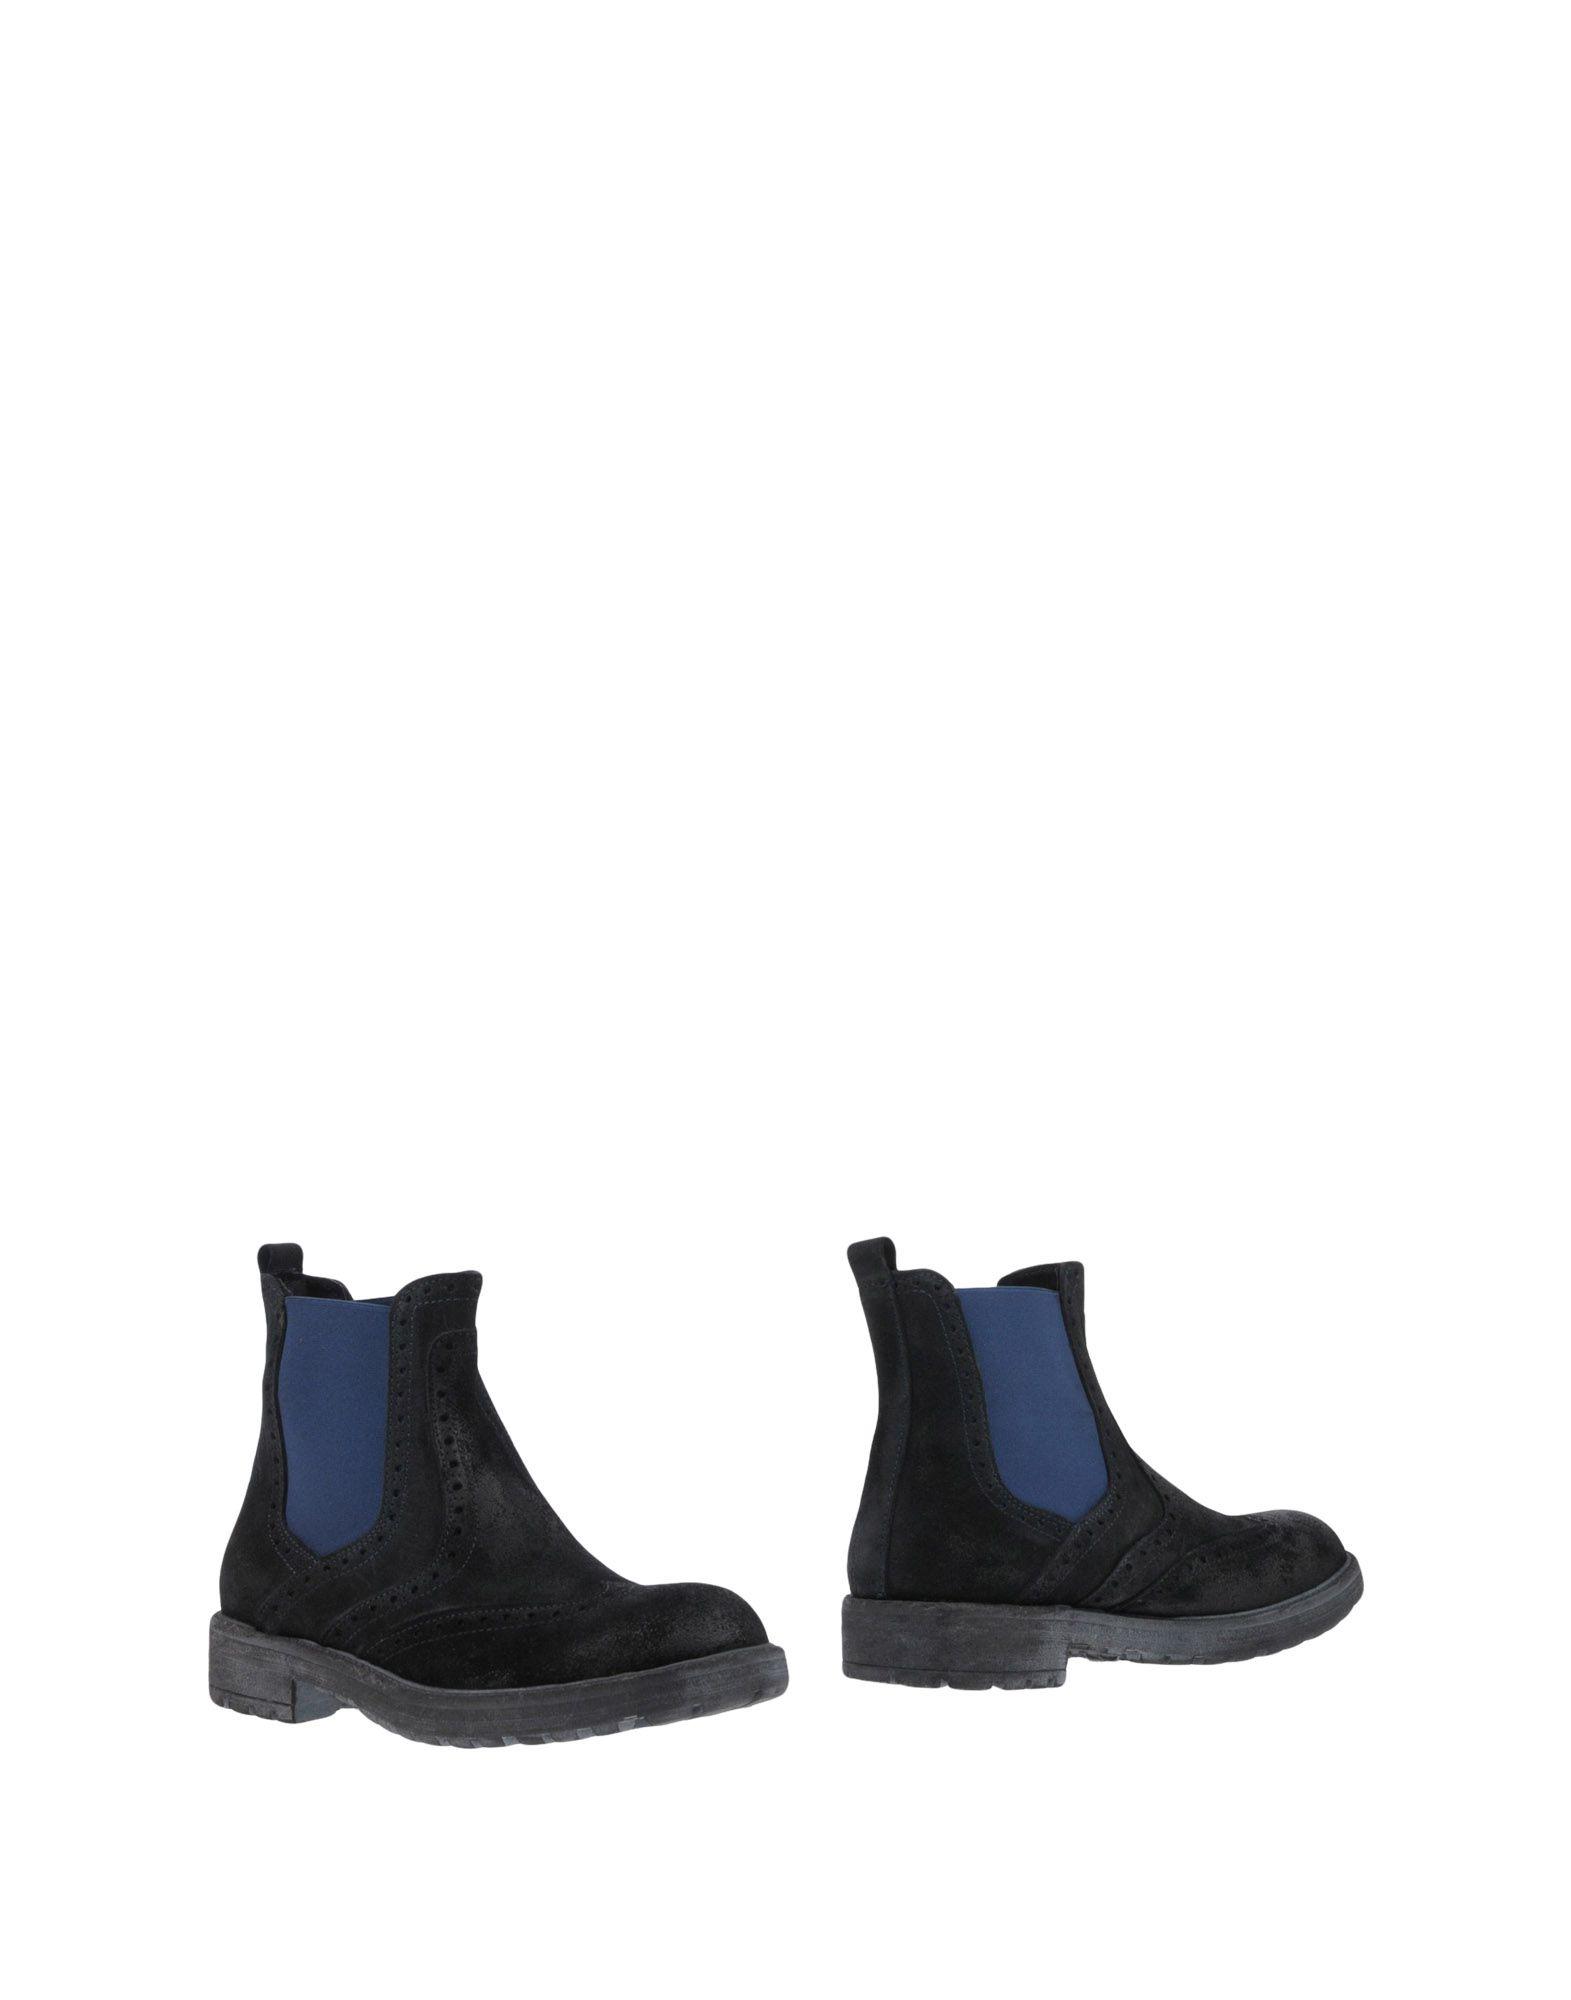 Gabardine Boots - Canada Men Gabardine Boots online on  Canada - - 11453658WB 0ec6c8